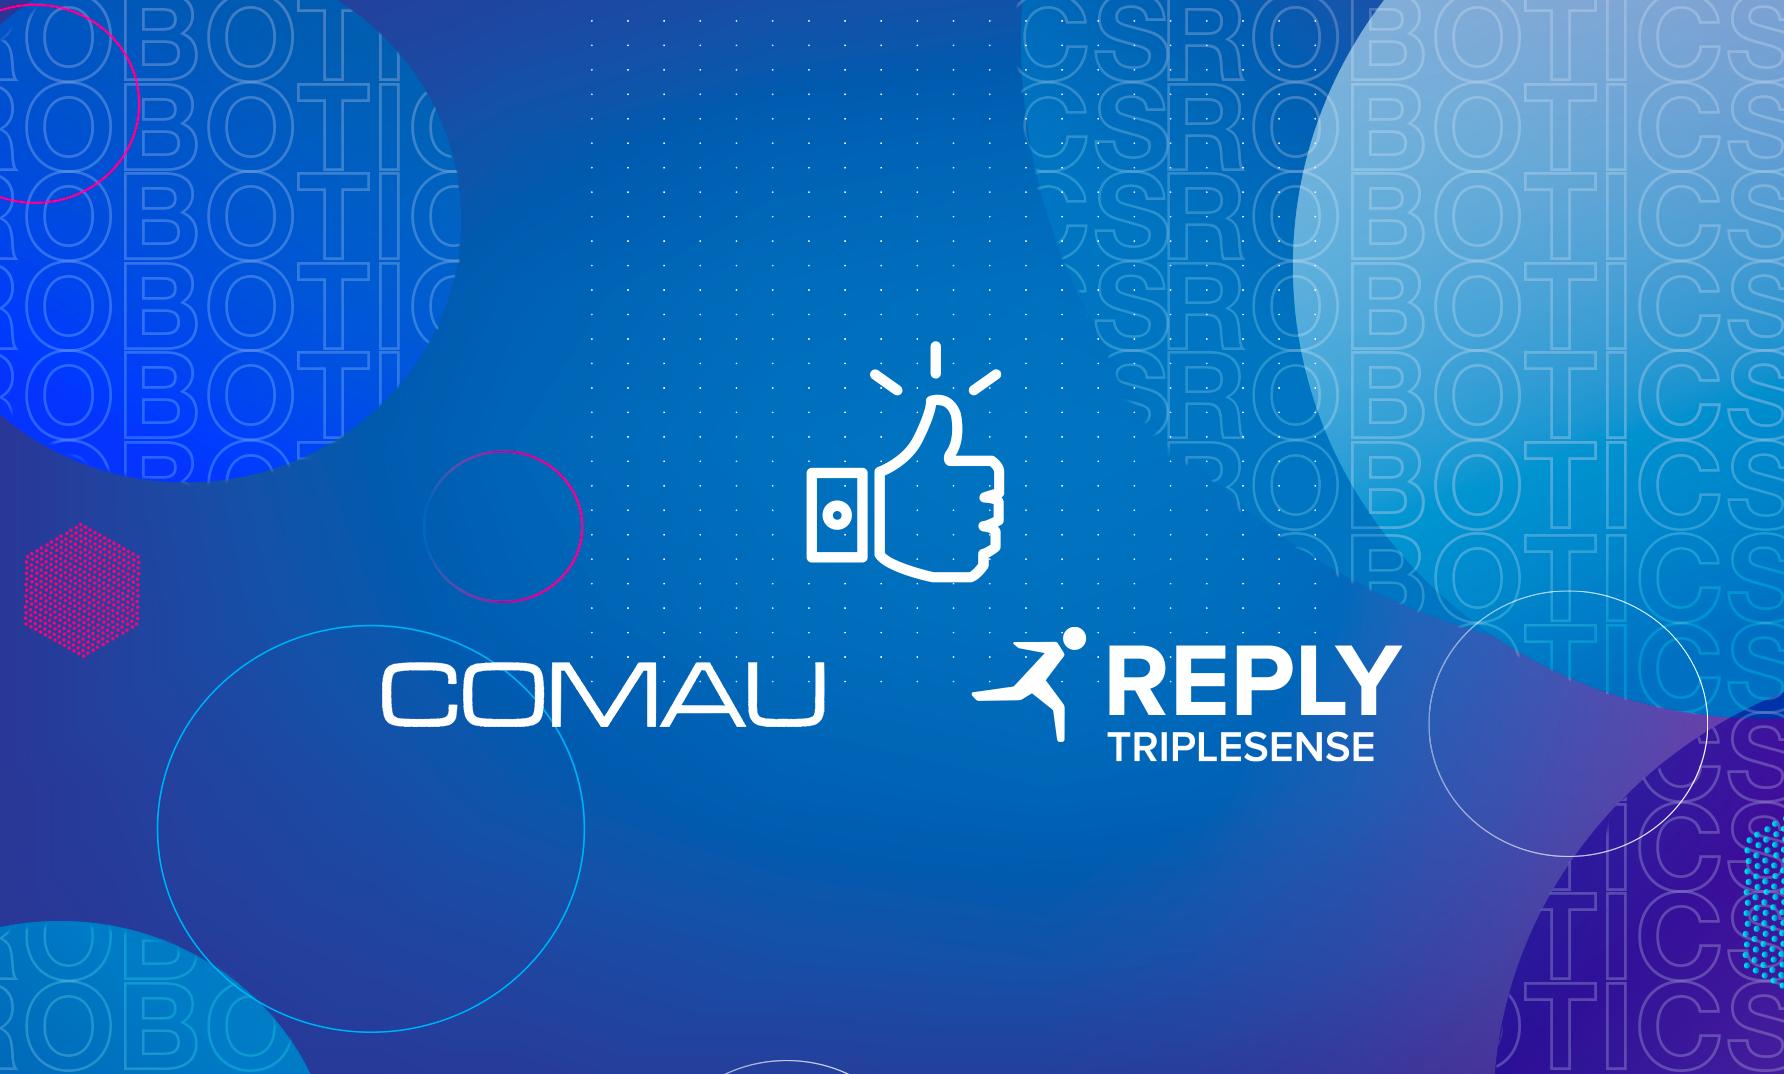 Comau_Robotics_1.png